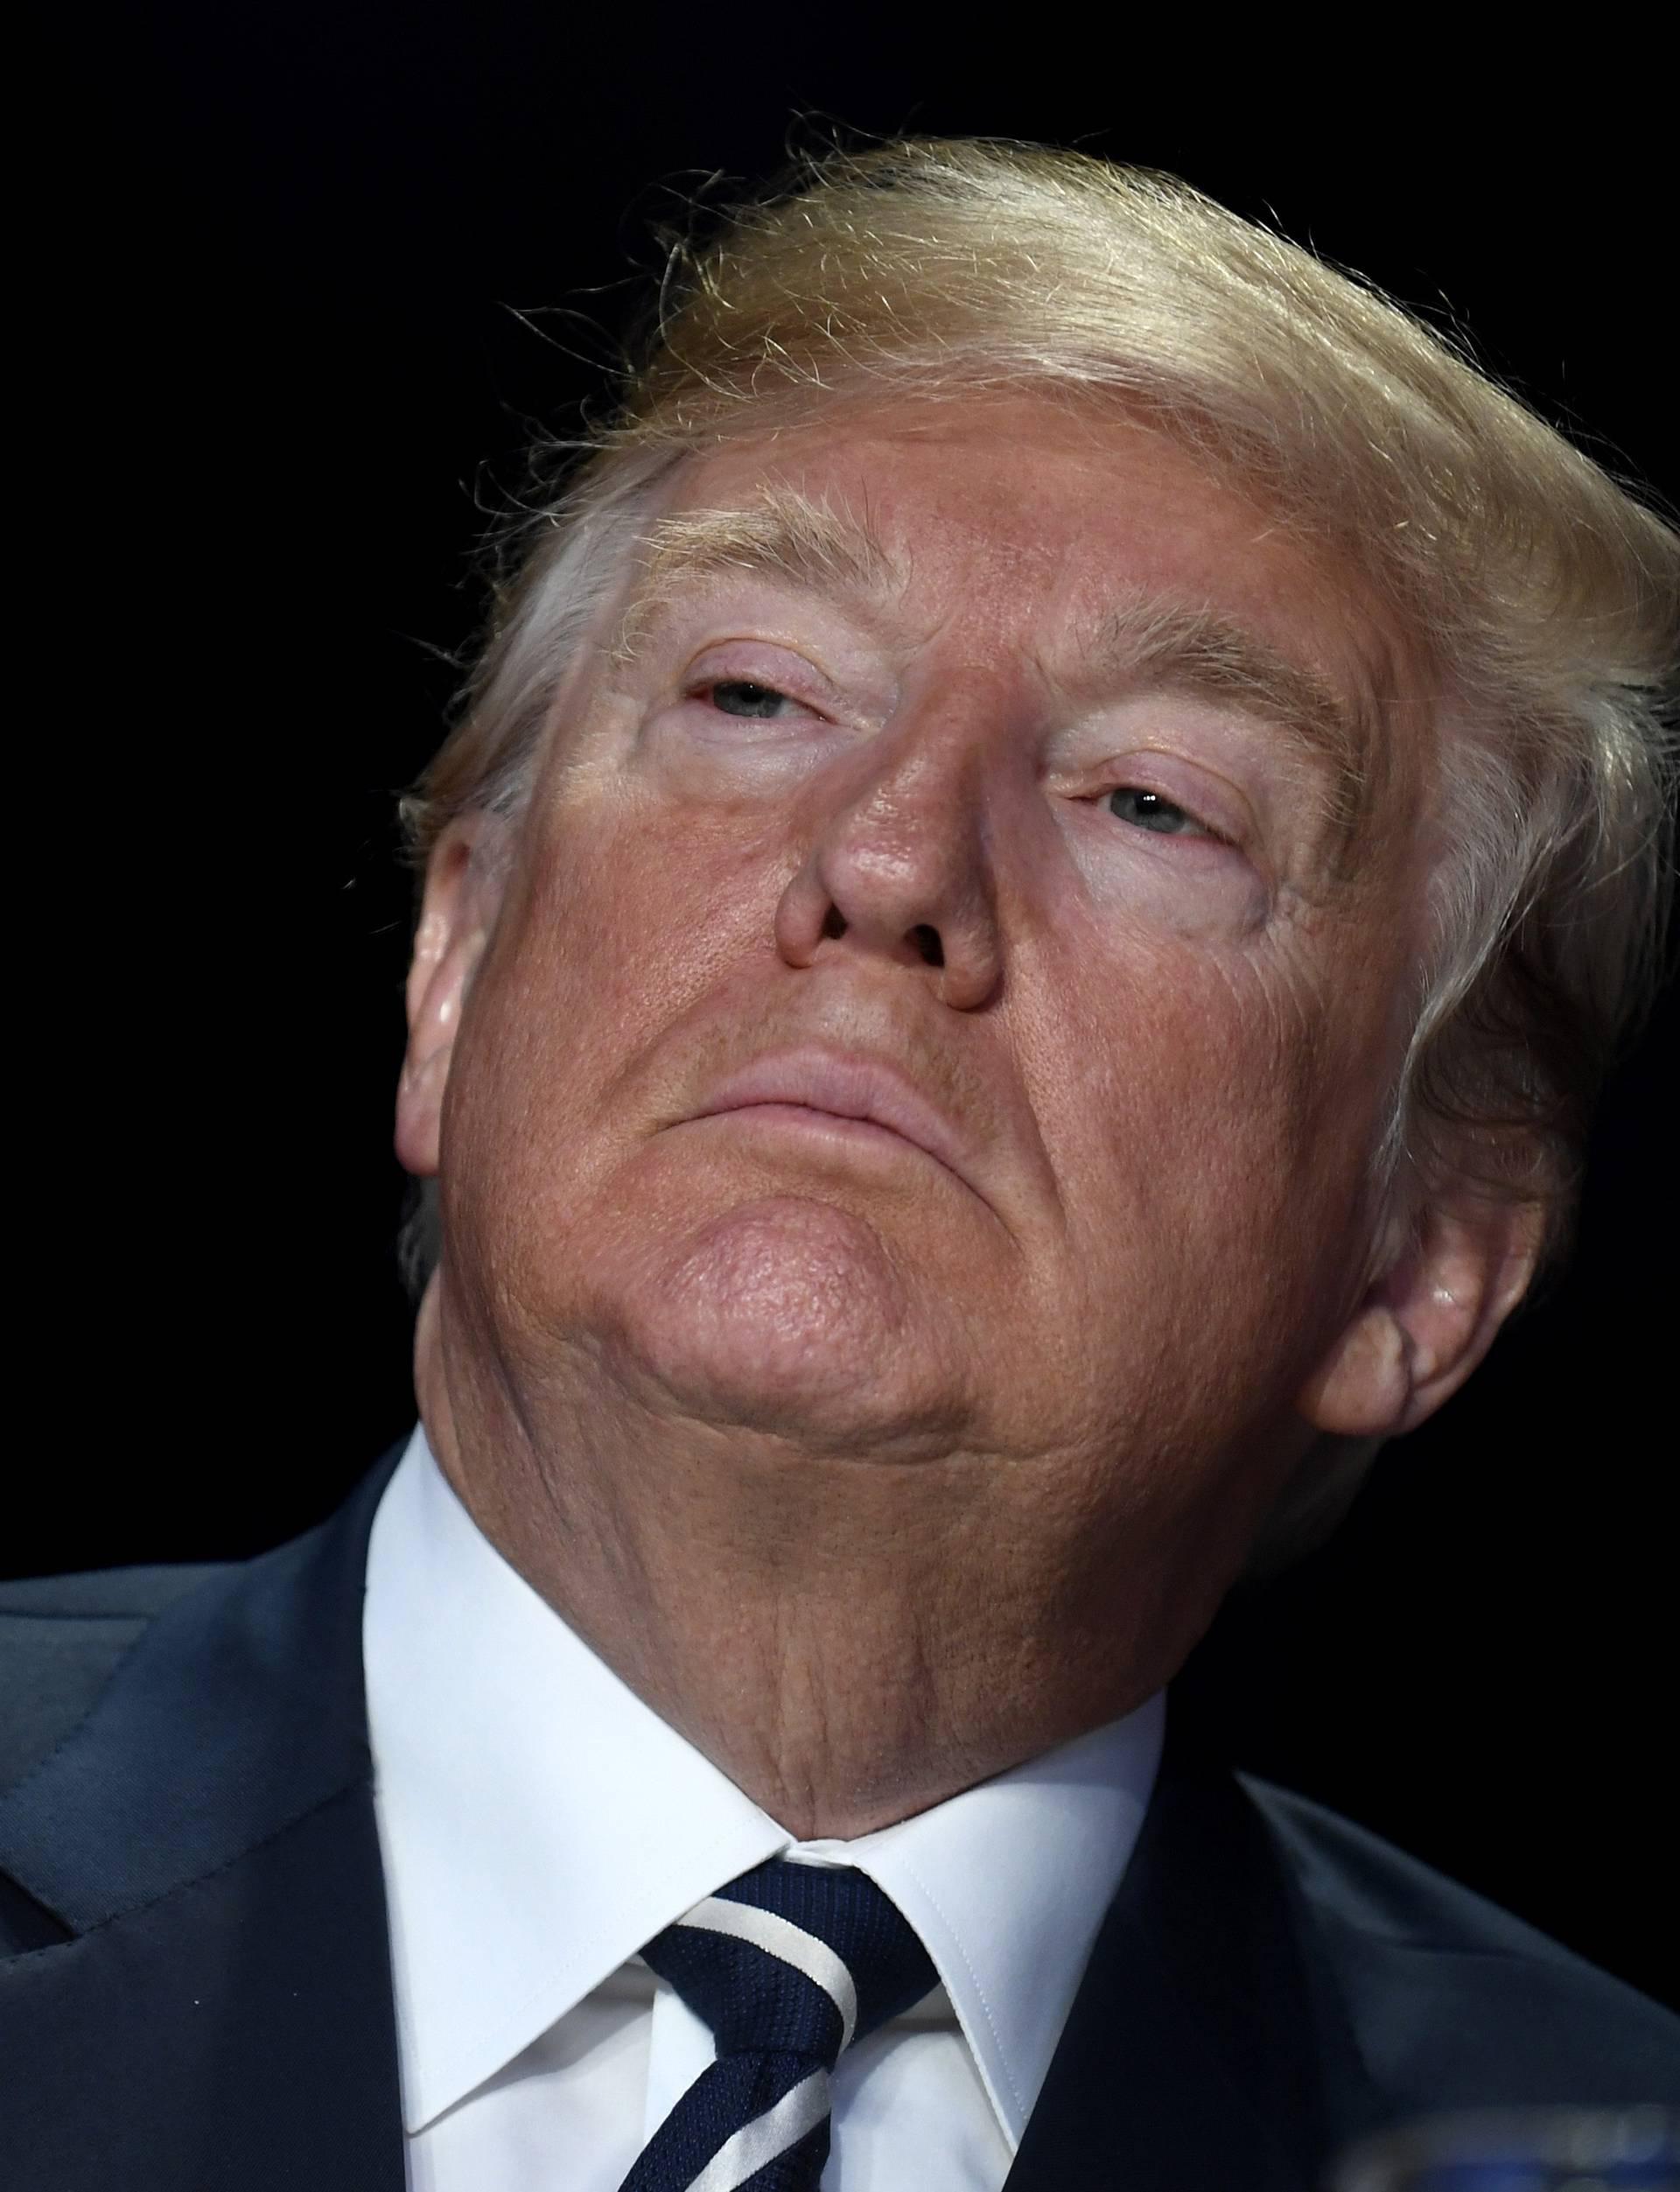 President Trump attends annual National Prayer Breakfast